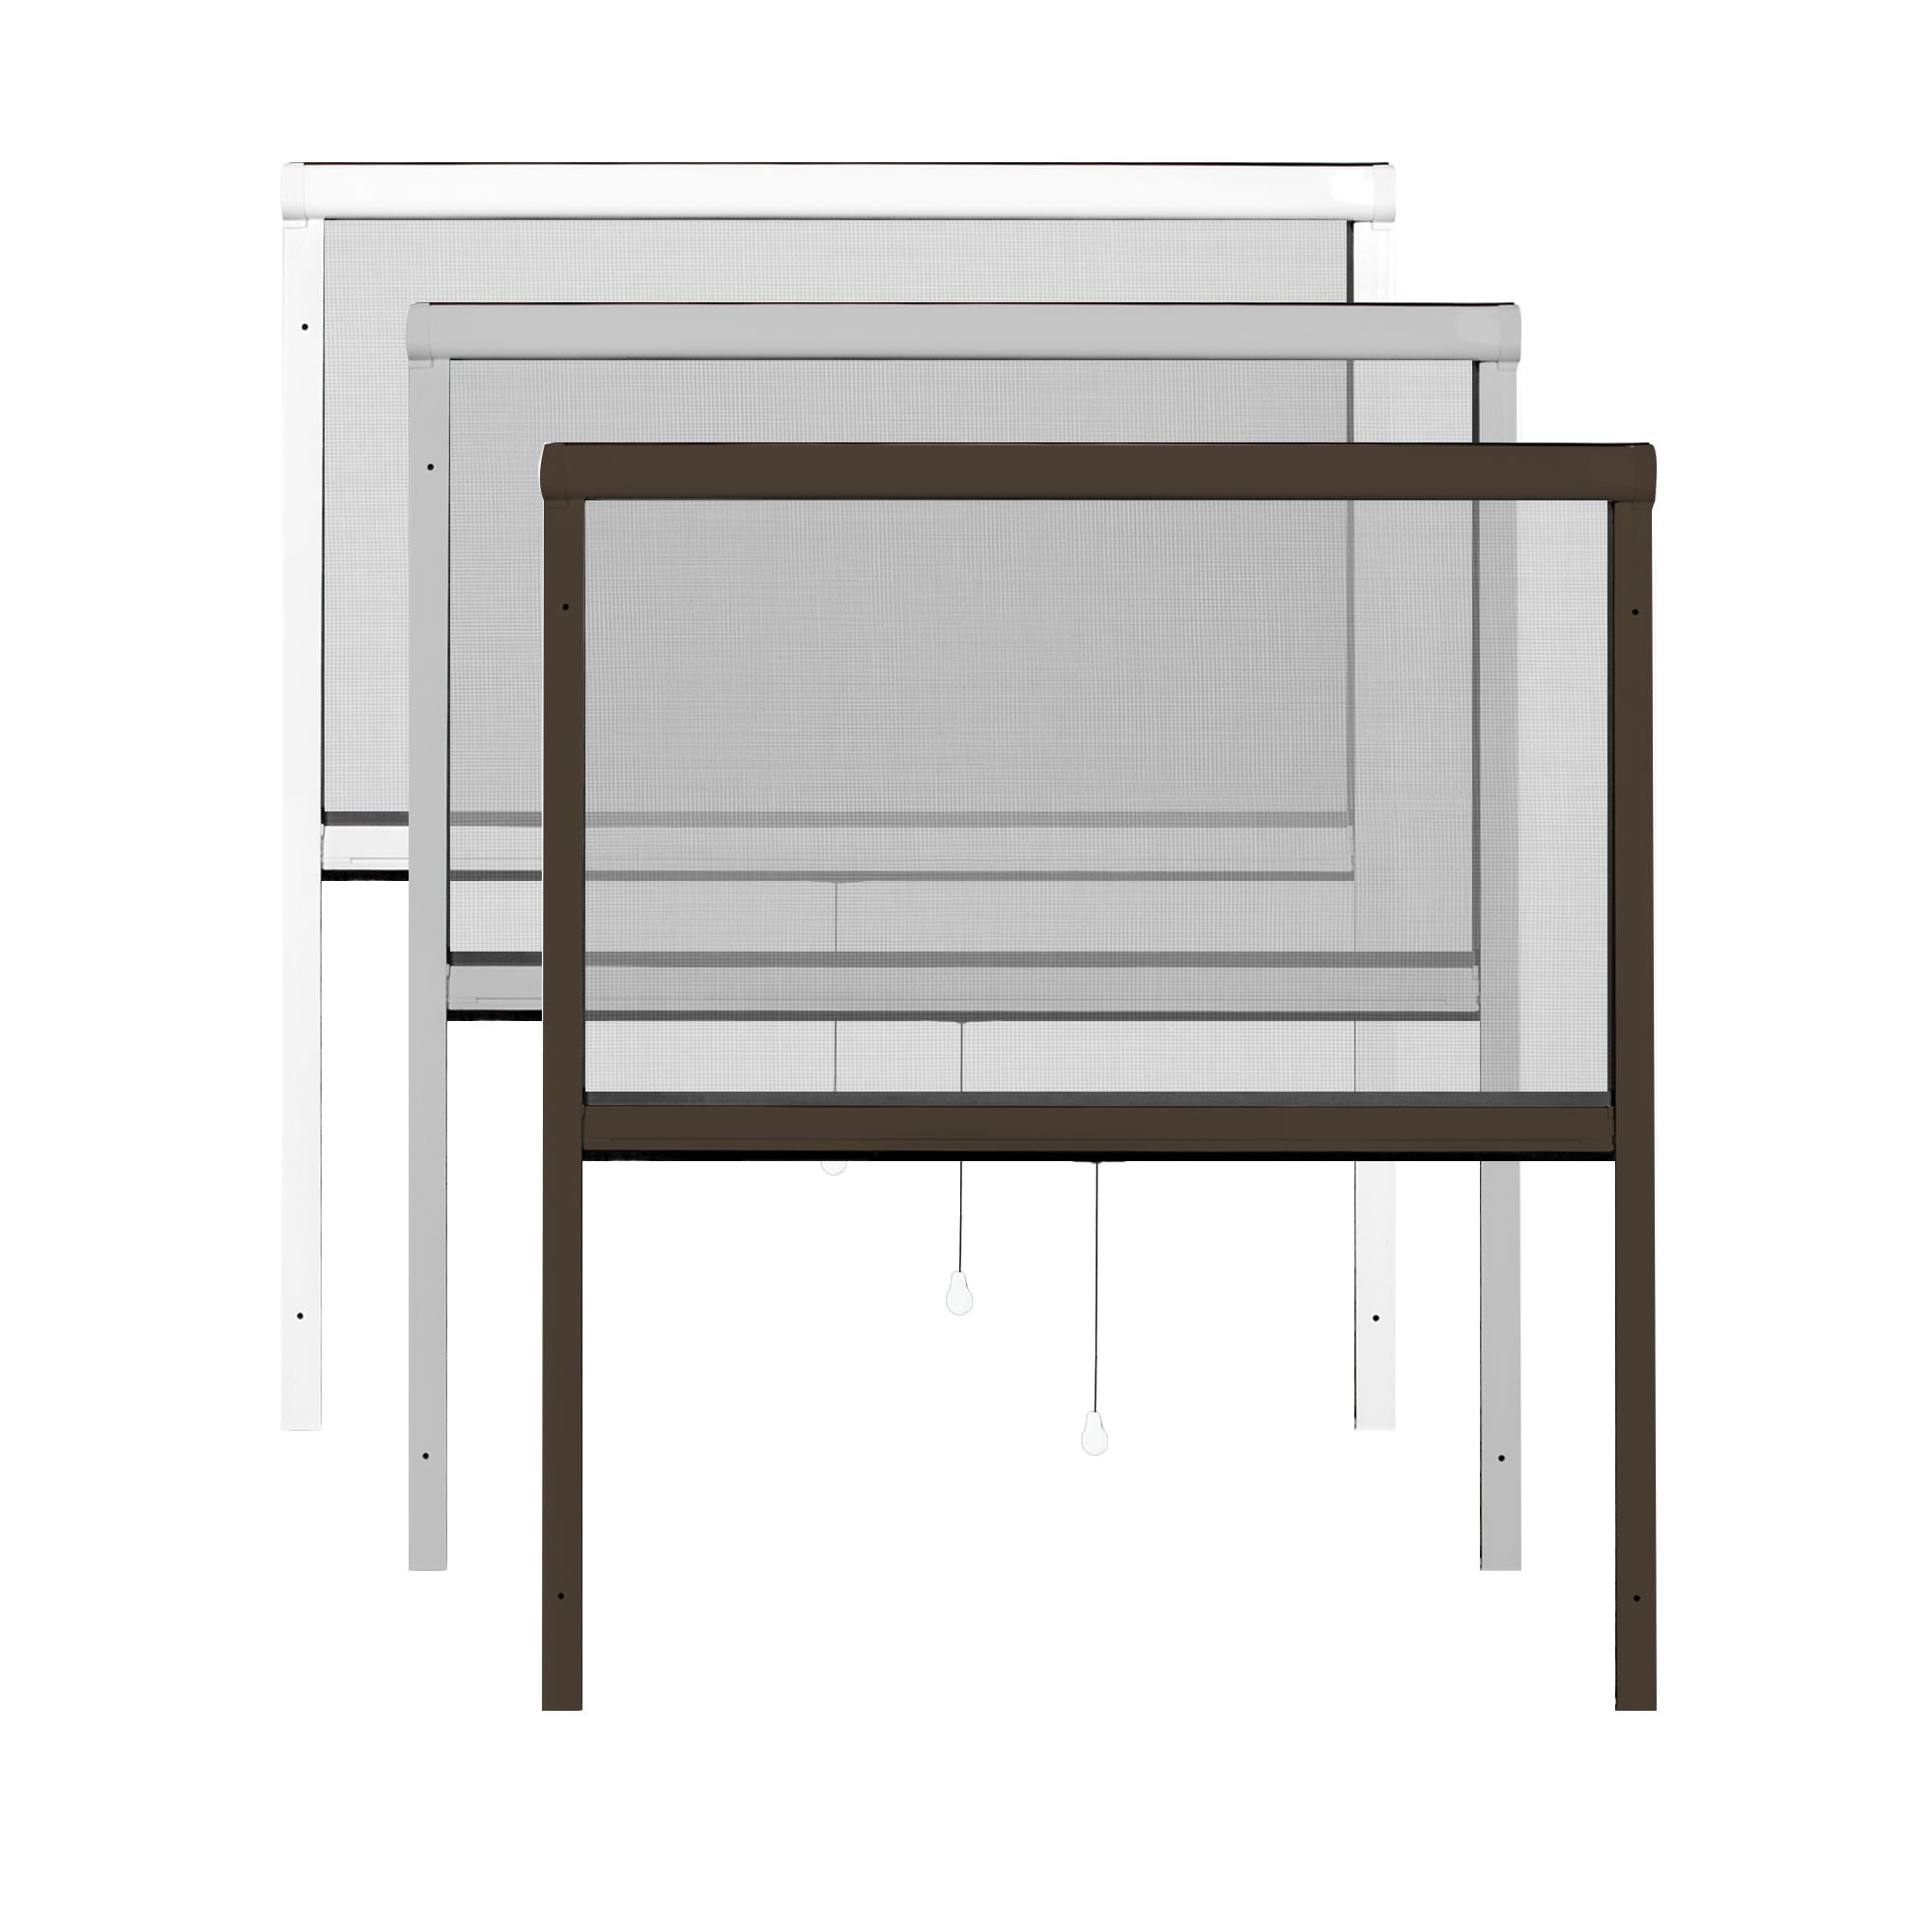 jarolift insektenschutz drehrahmen t rrahmen fliegengitter t r 120x220cm wei ebay. Black Bedroom Furniture Sets. Home Design Ideas